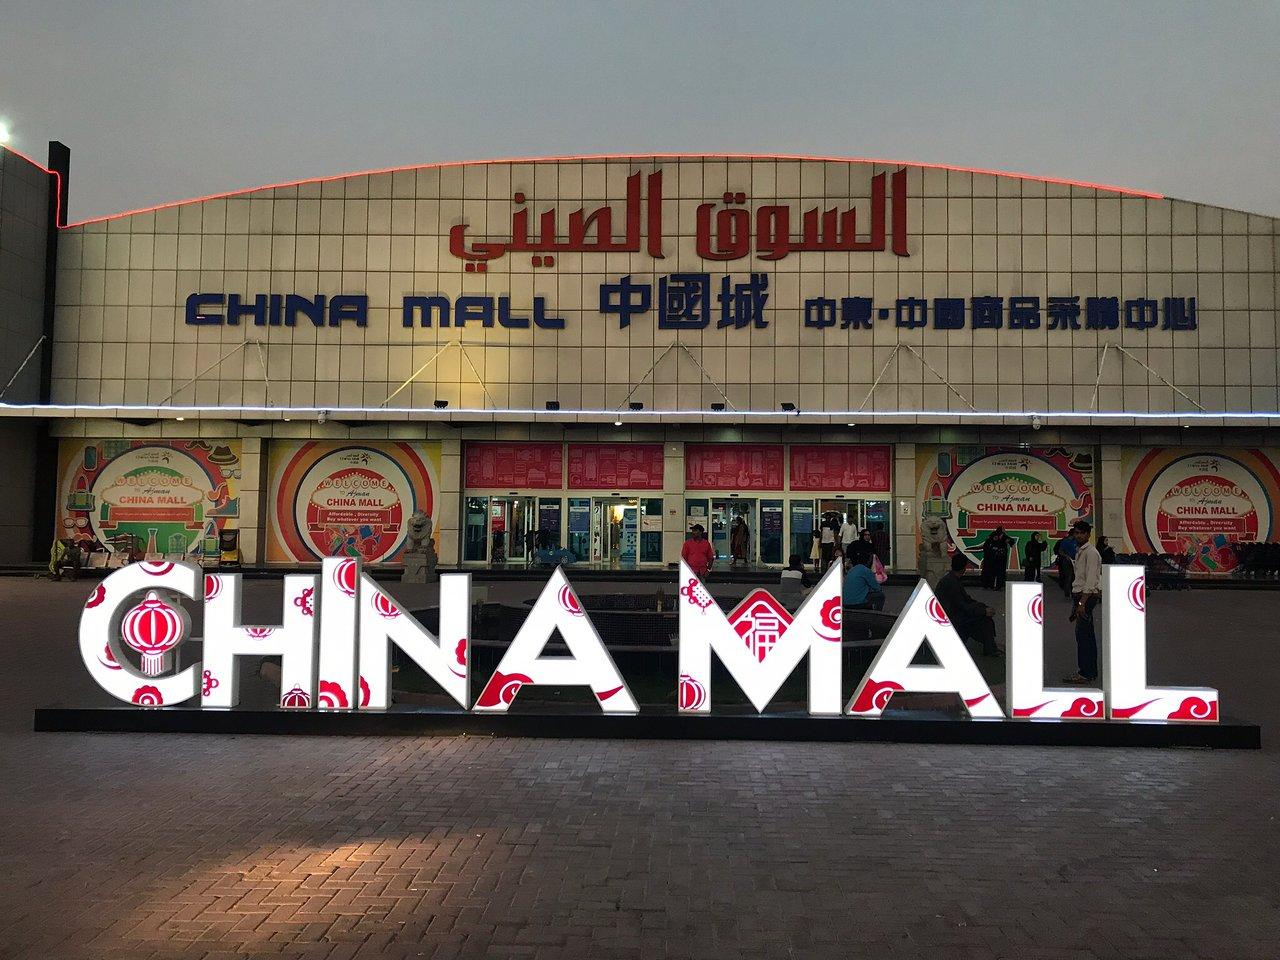 ajman china mall - aktuelle 2019 - lohnt es sich? (mit fotos)